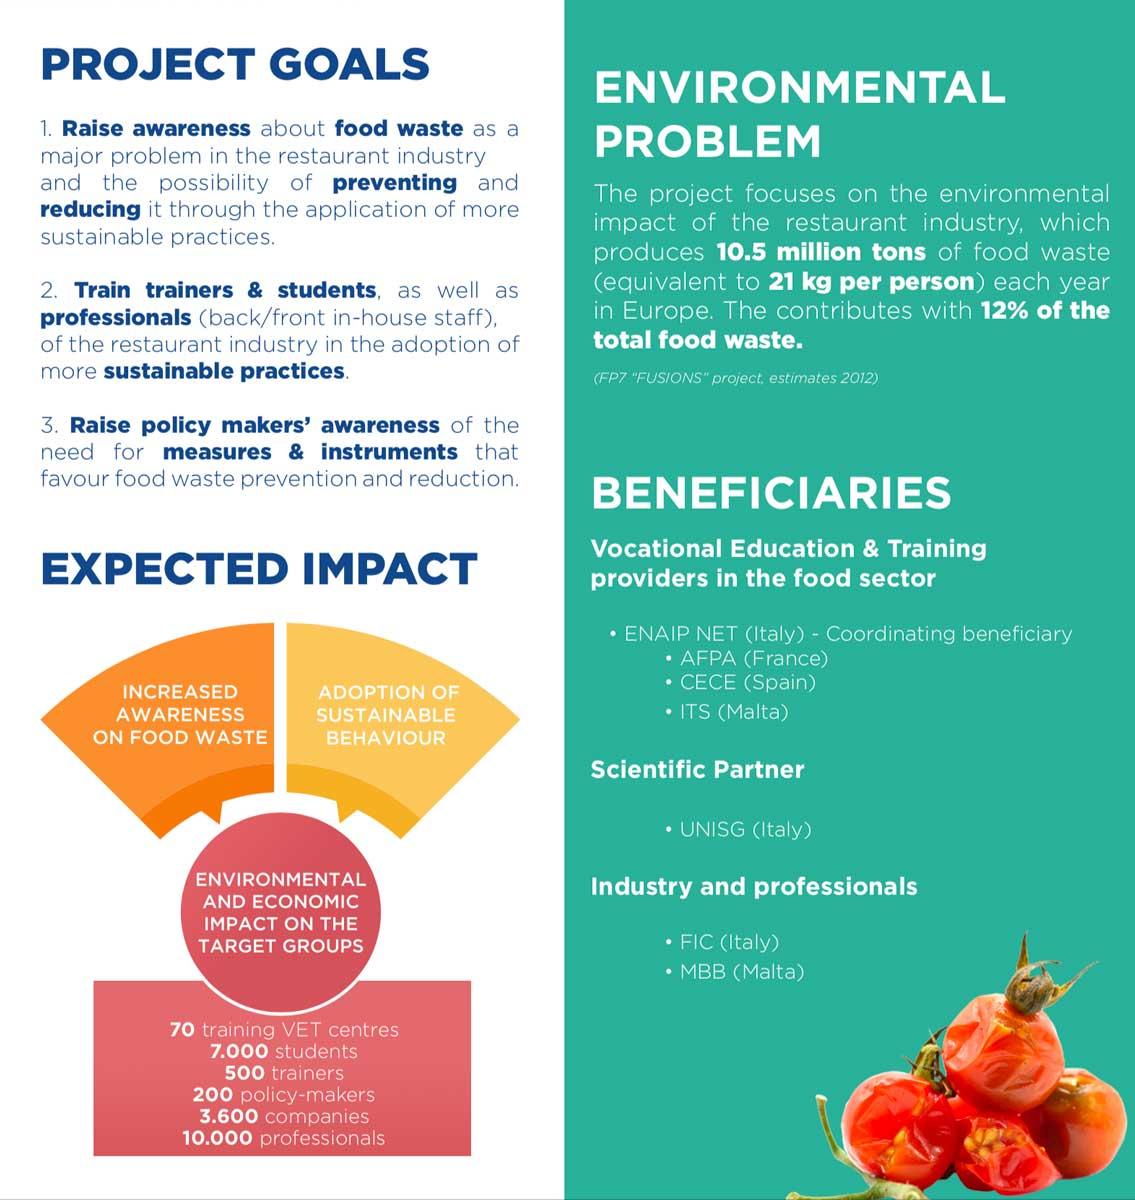 Foster, Life, EuropeanCommission, VET, FoodWaste, Training, Sustainability, Gastronomic, Food waste, restaurant industry, circular economy